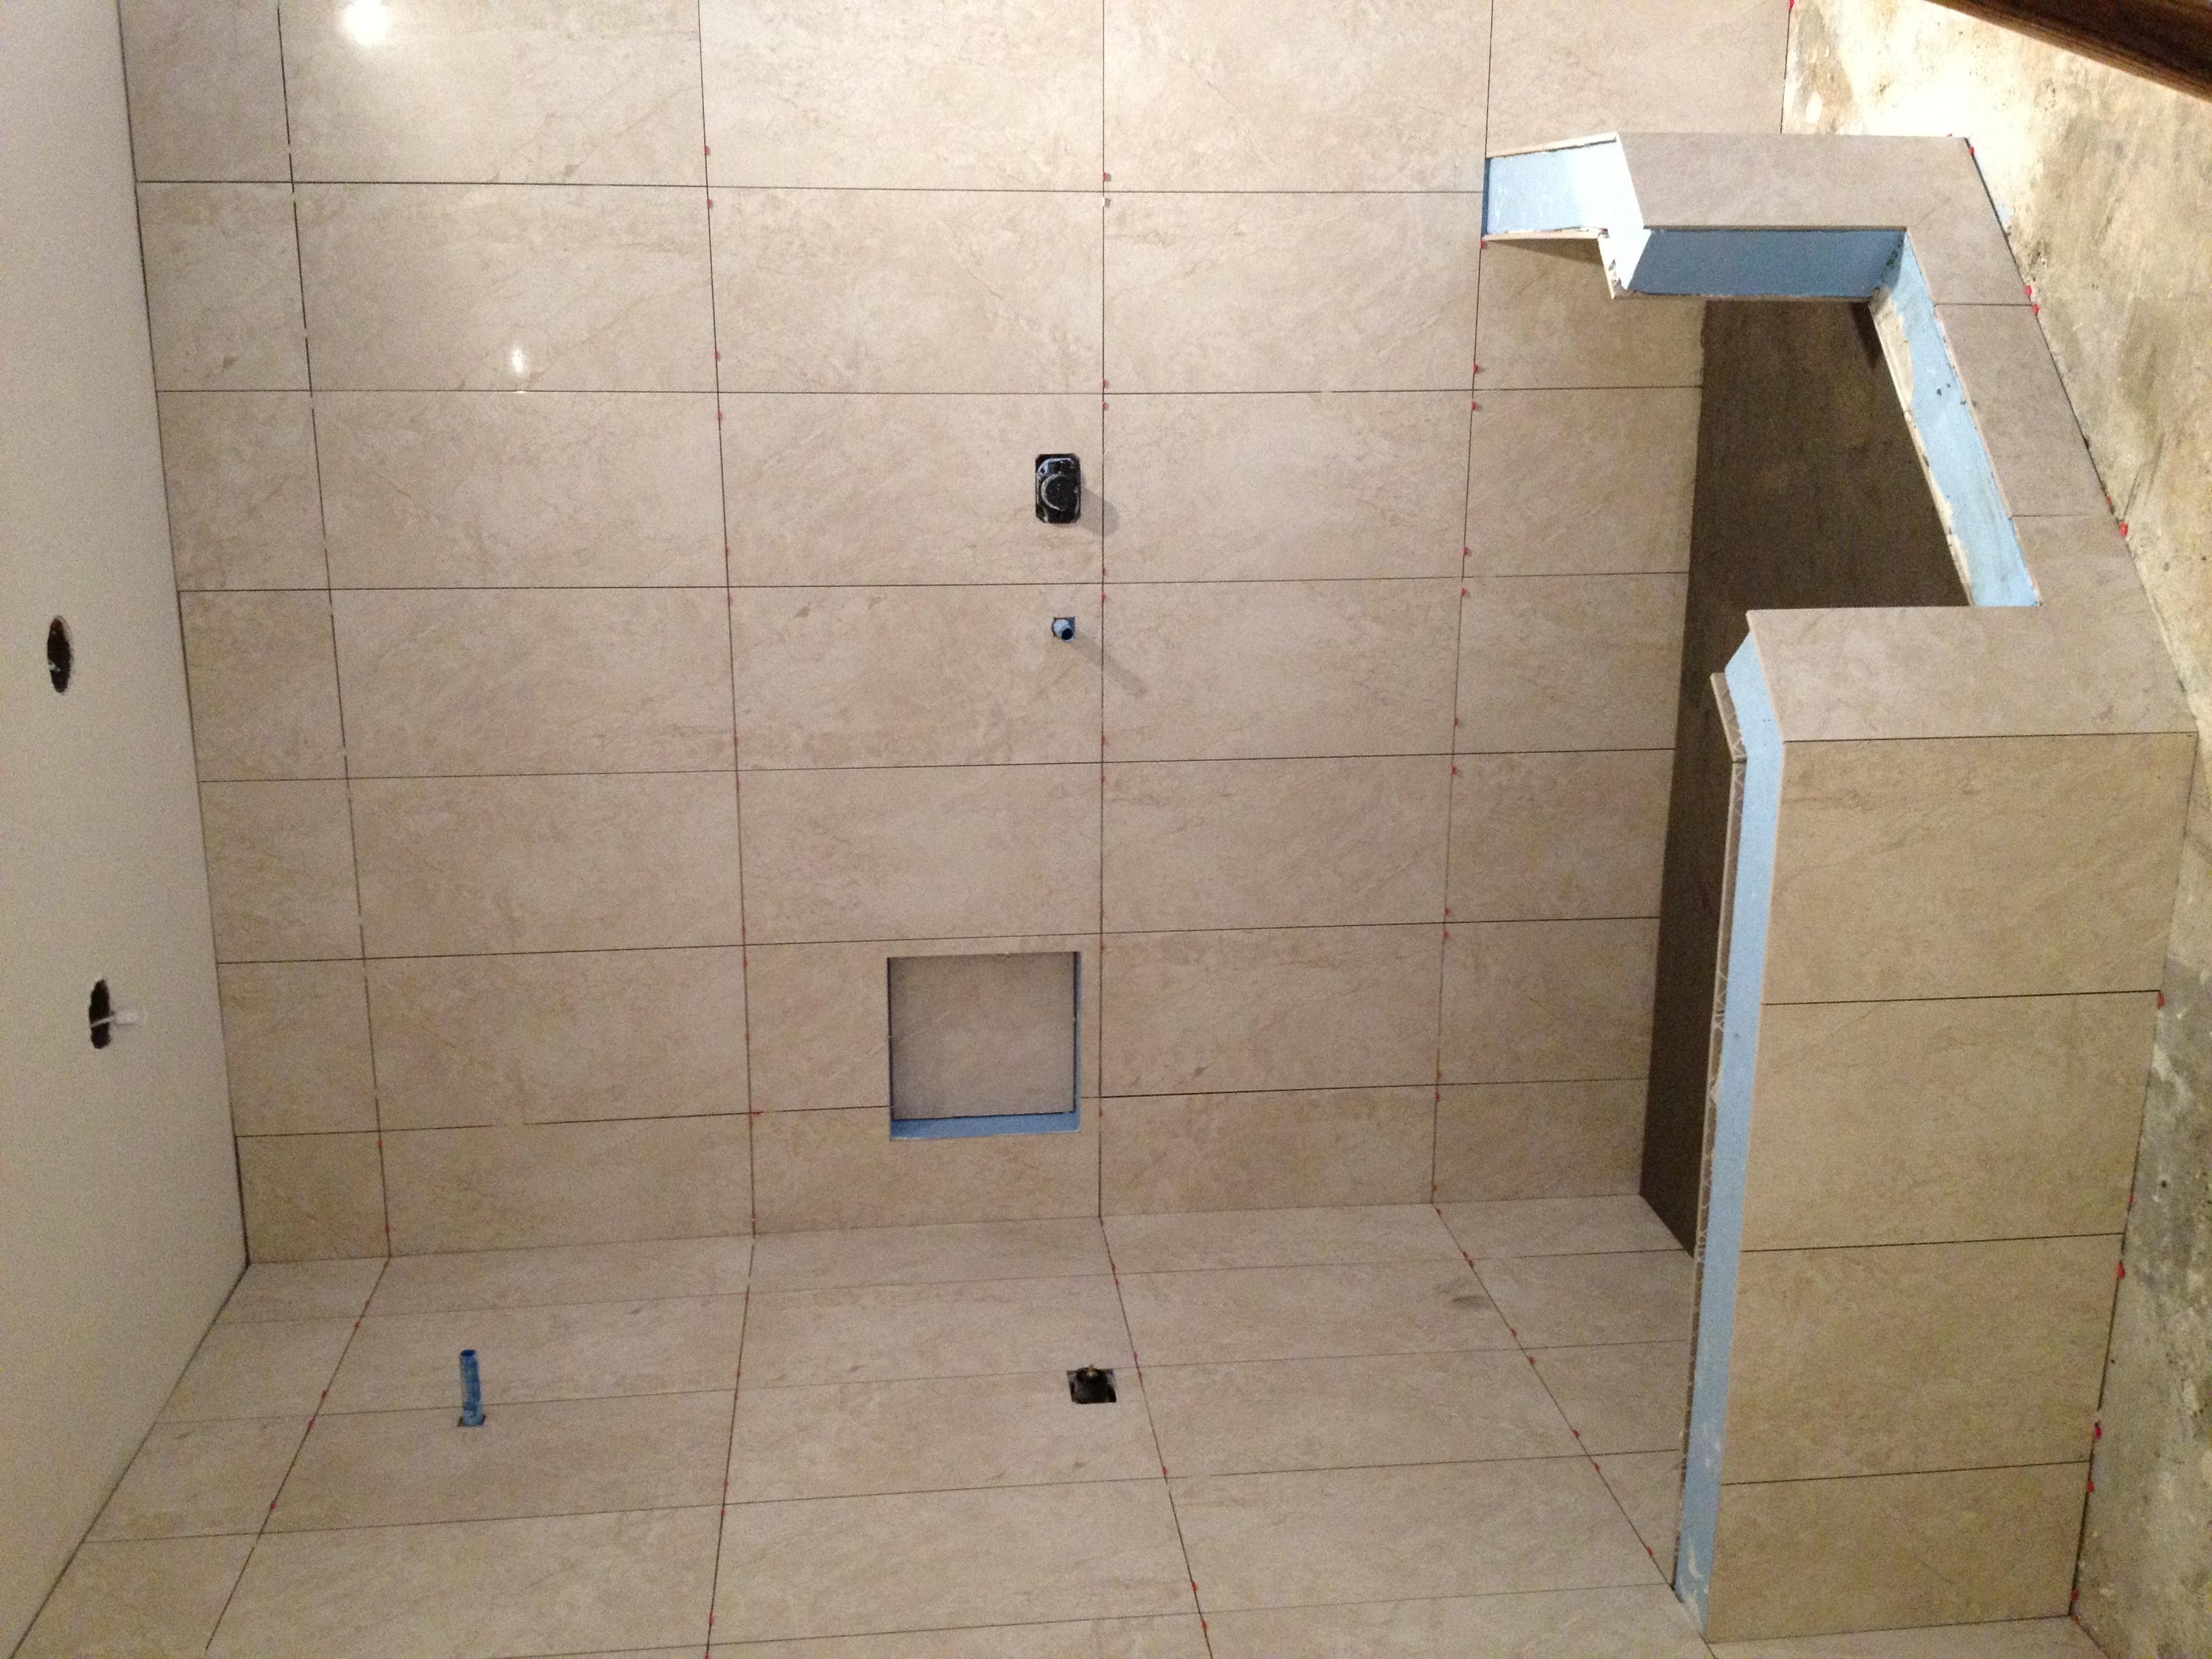 Bathroom Tile Jobs : Recent tile jobs mann design studio and installation